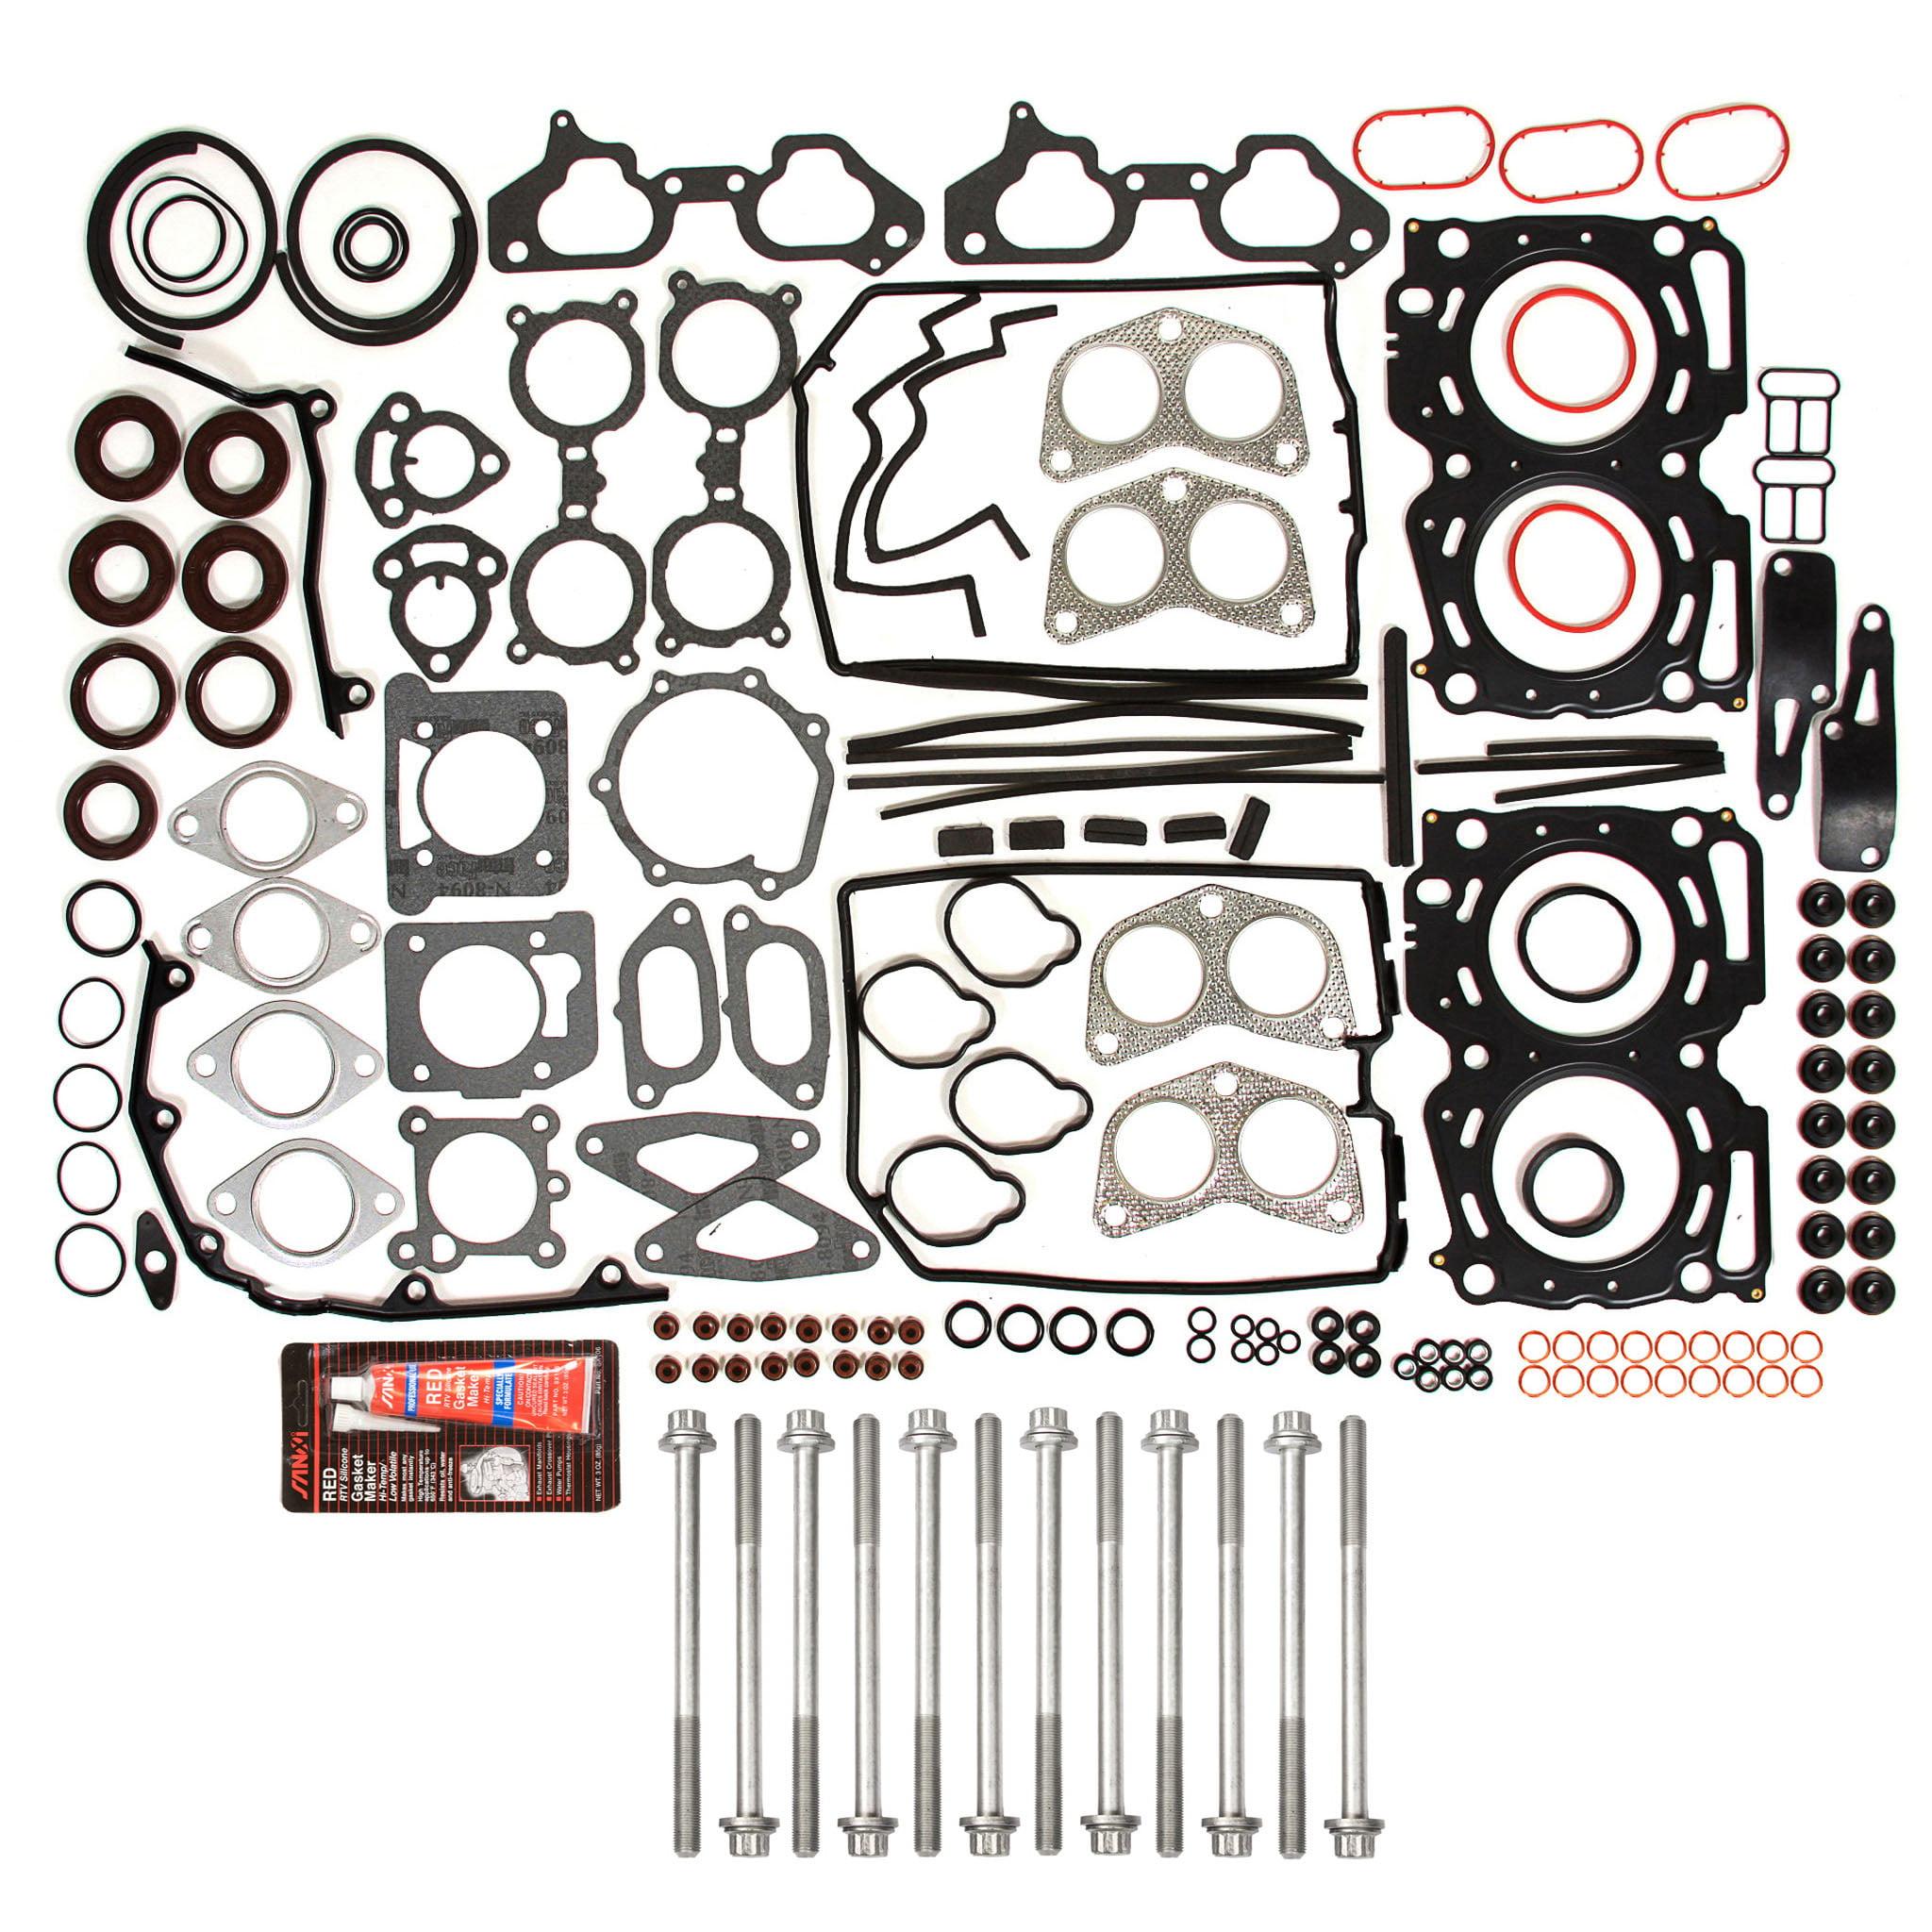 MLS Full Gasket Set Fits 02-05 Subaru Impreza WRX Turbo USDM 2.0 DOHC EJ205